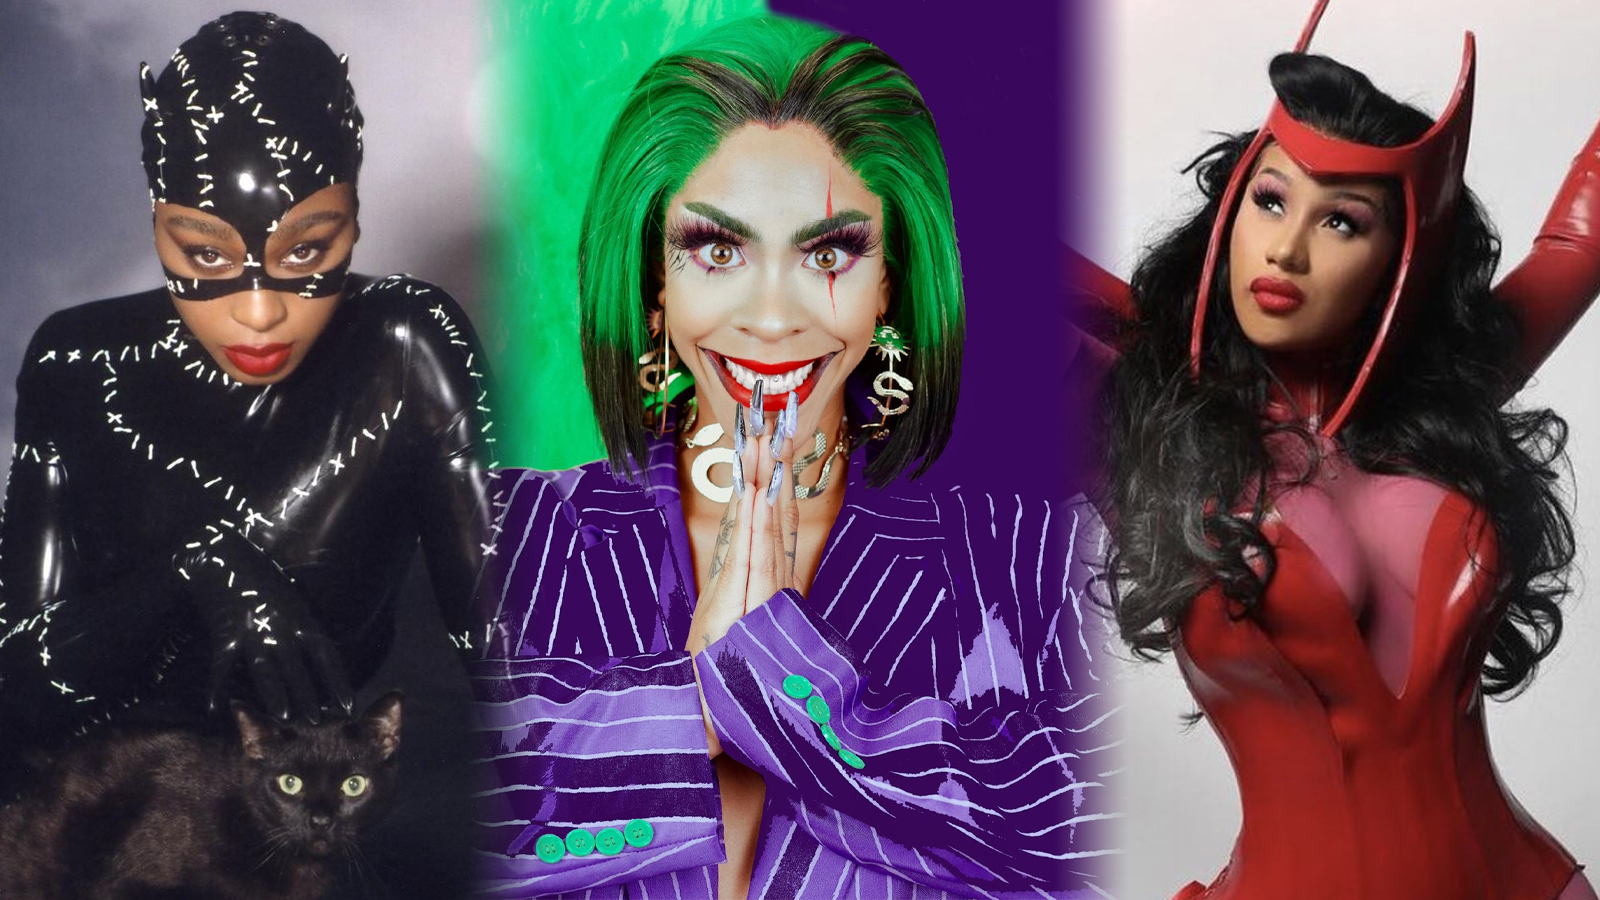 Normani, Rico Nasty and Cardi B for Halloween 2020